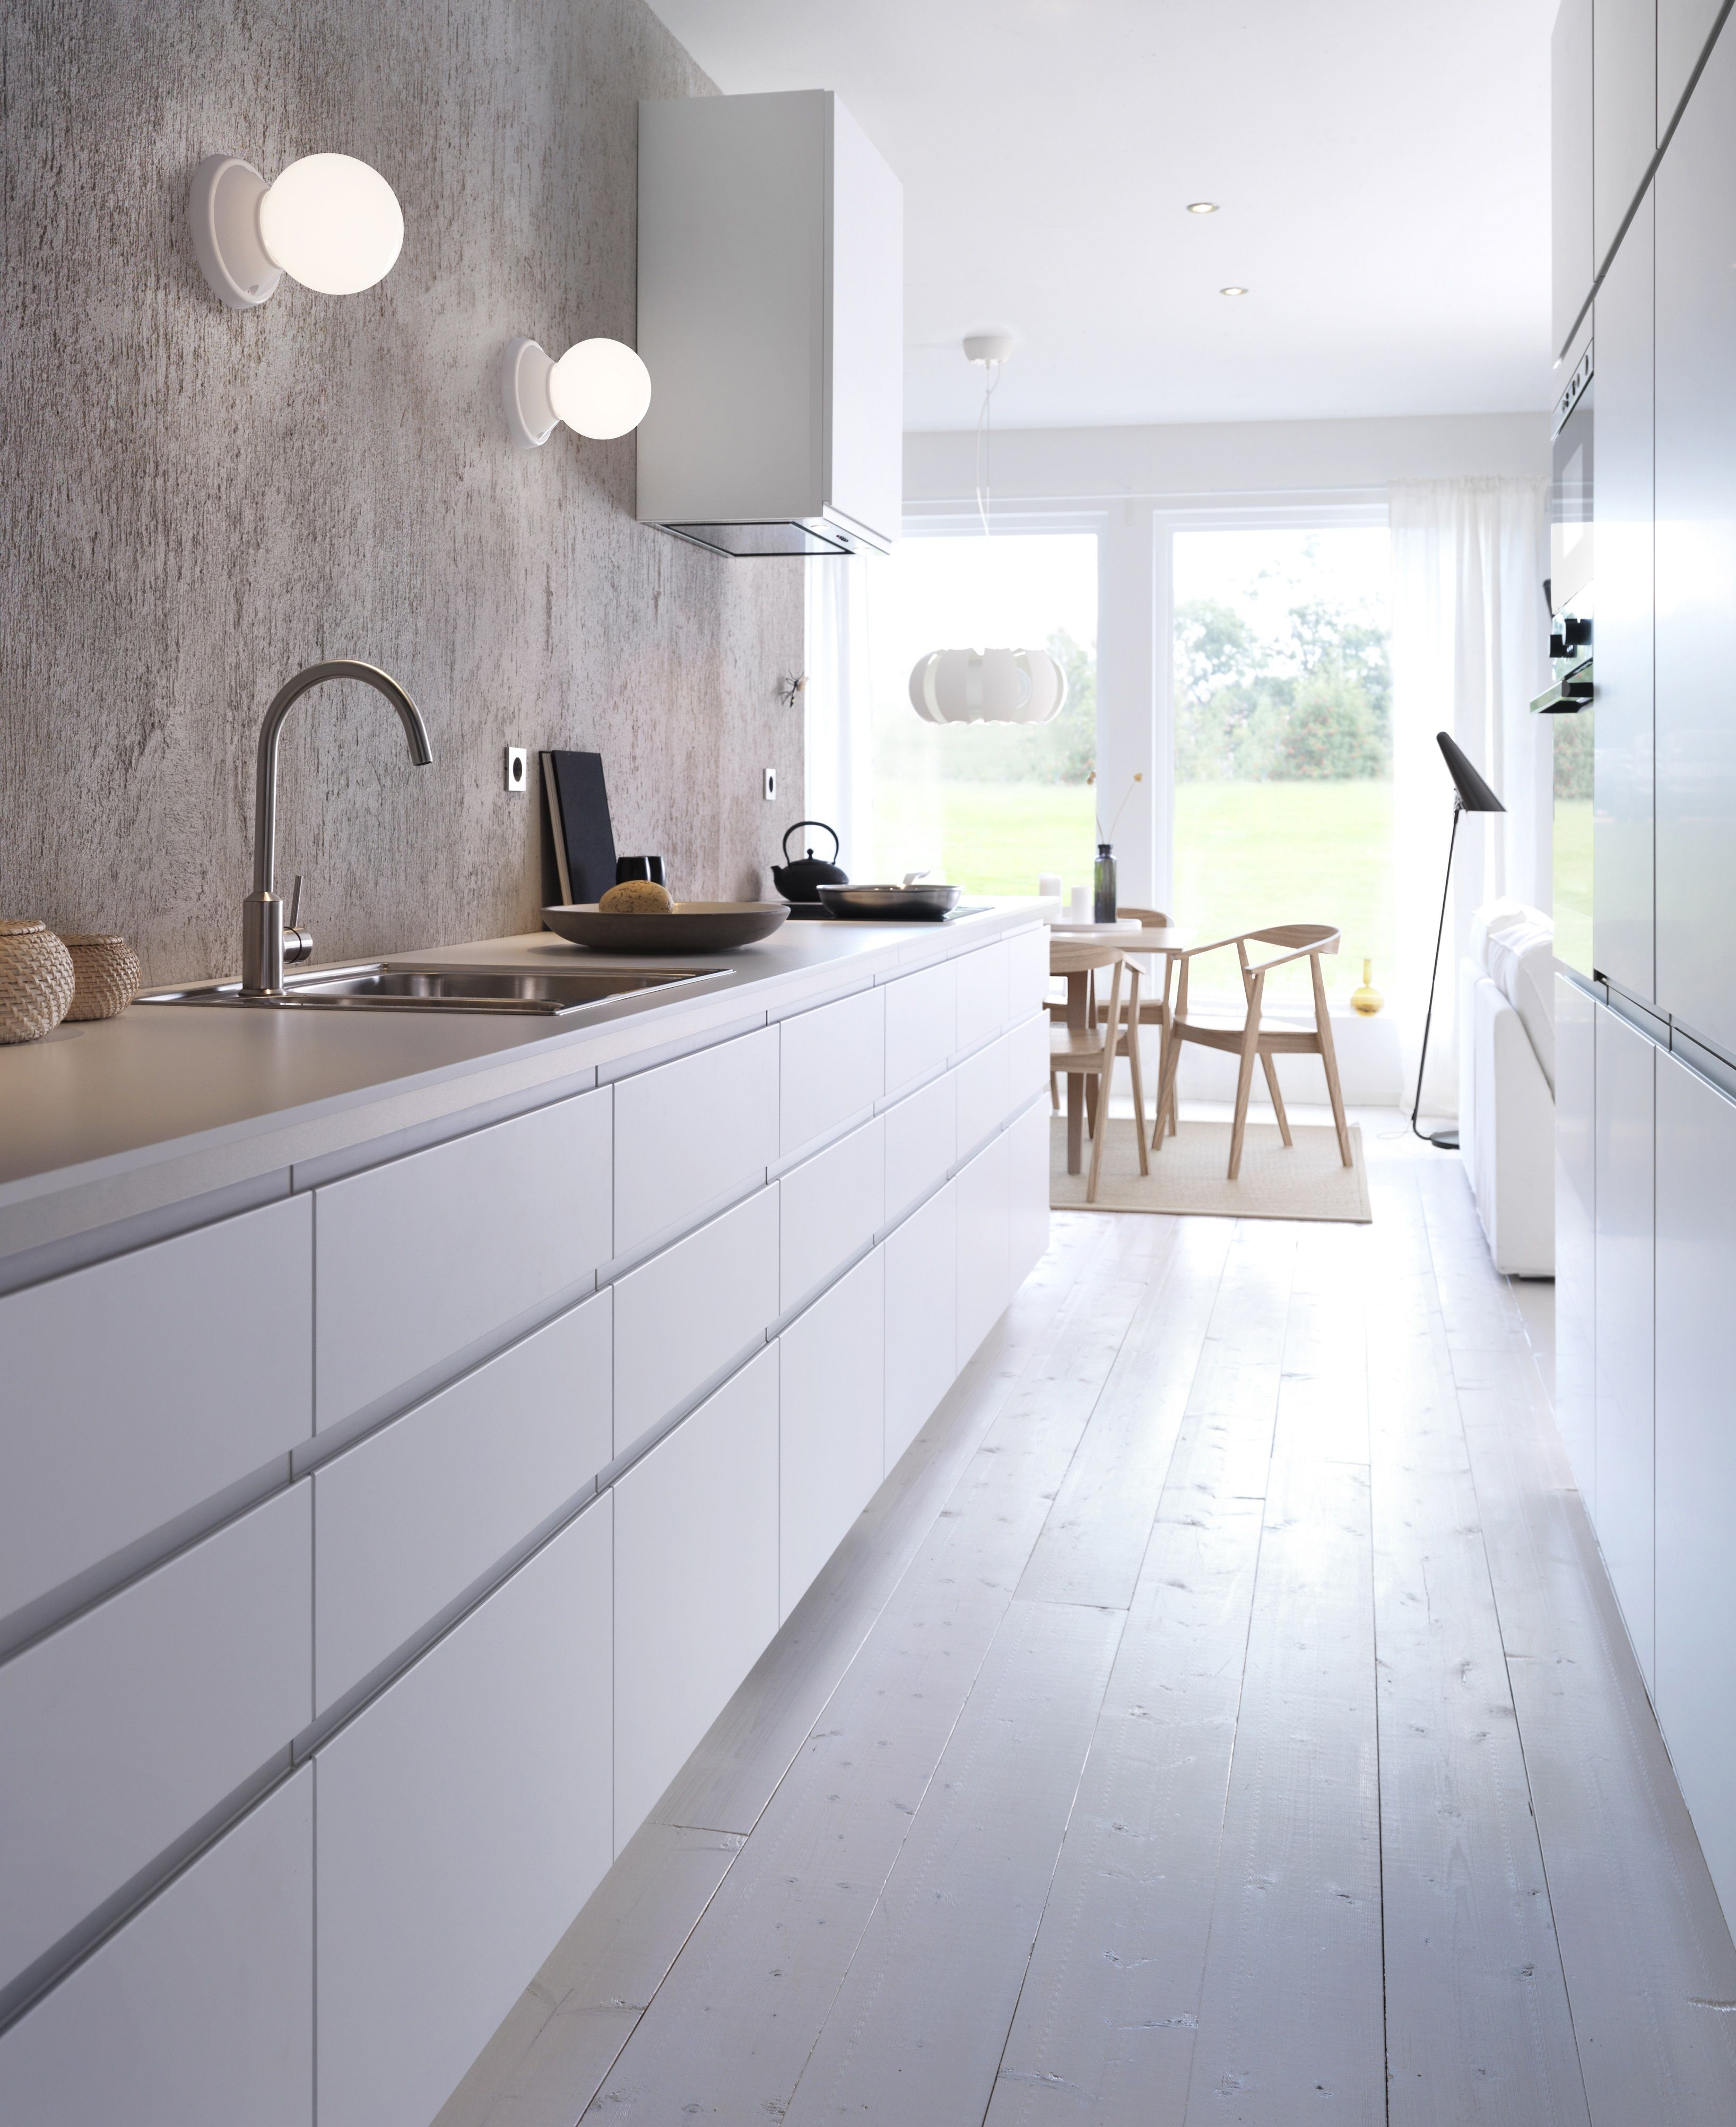 Metod keuken ikea ikeanl modern greeploos for Metod keuken